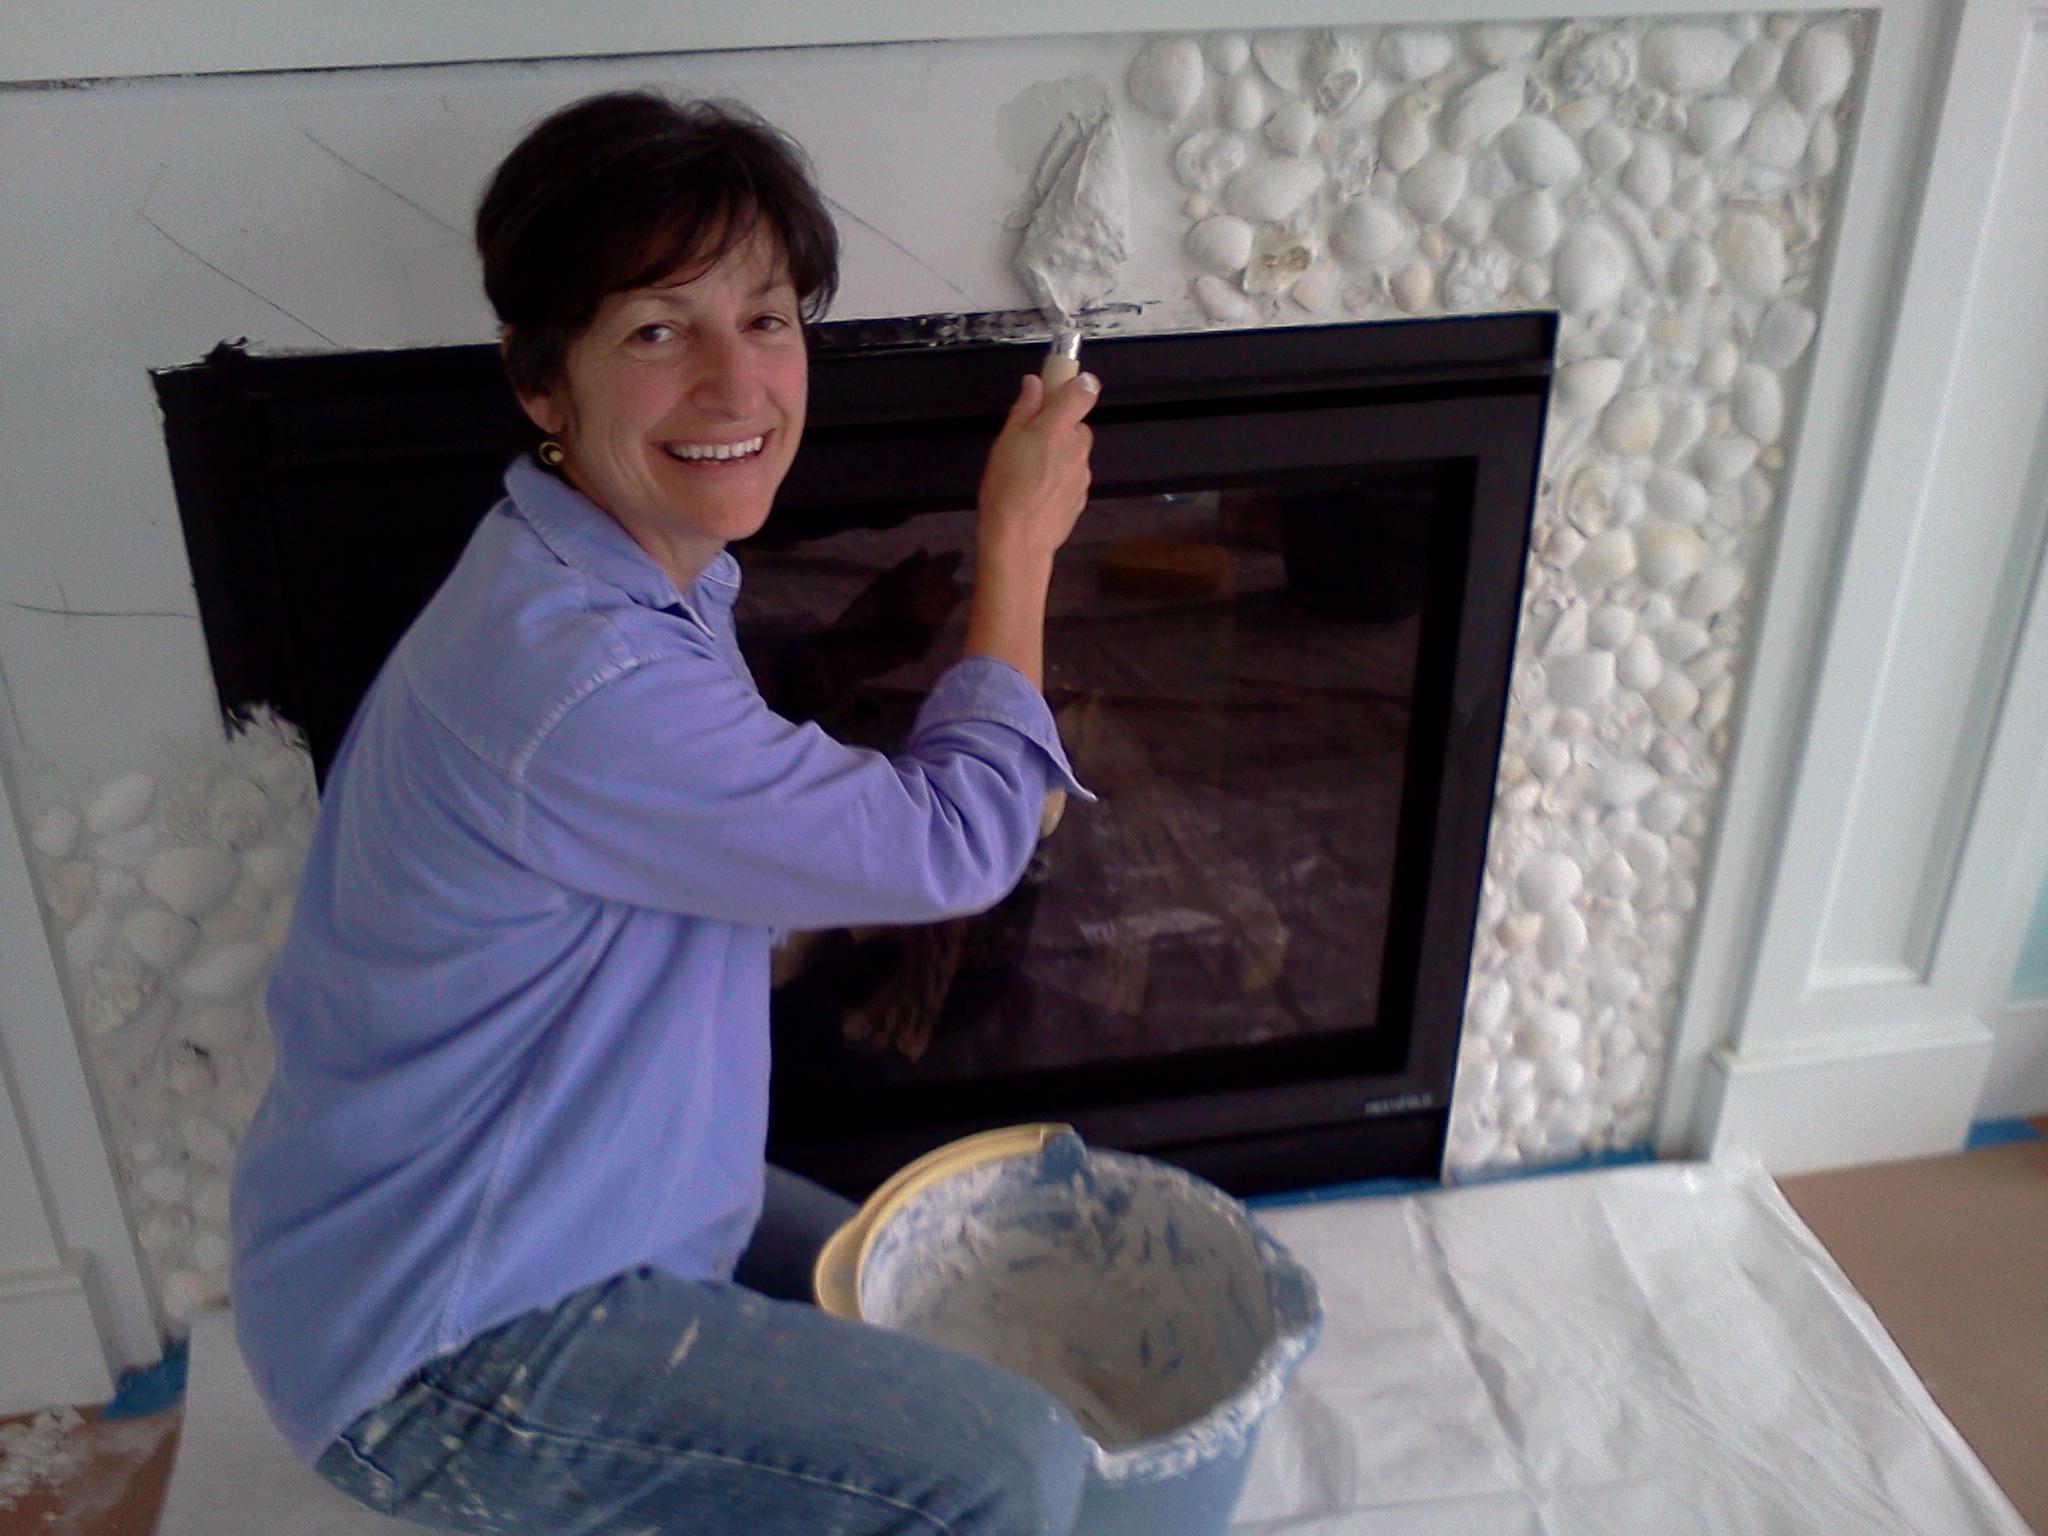 FireplacesurroundDME